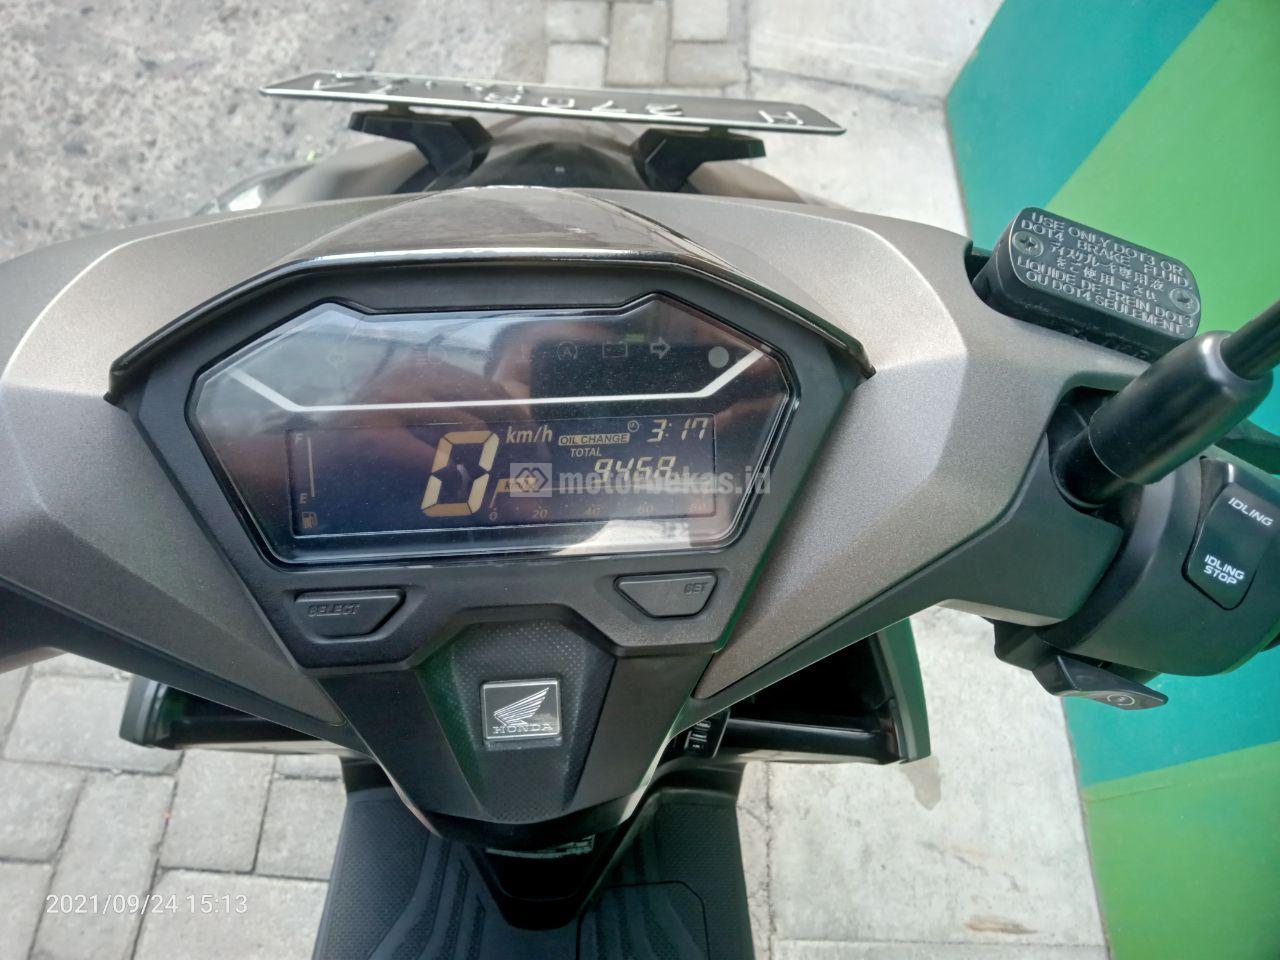 HONDA VARIO 125 ISS 2019 motorbekas.id